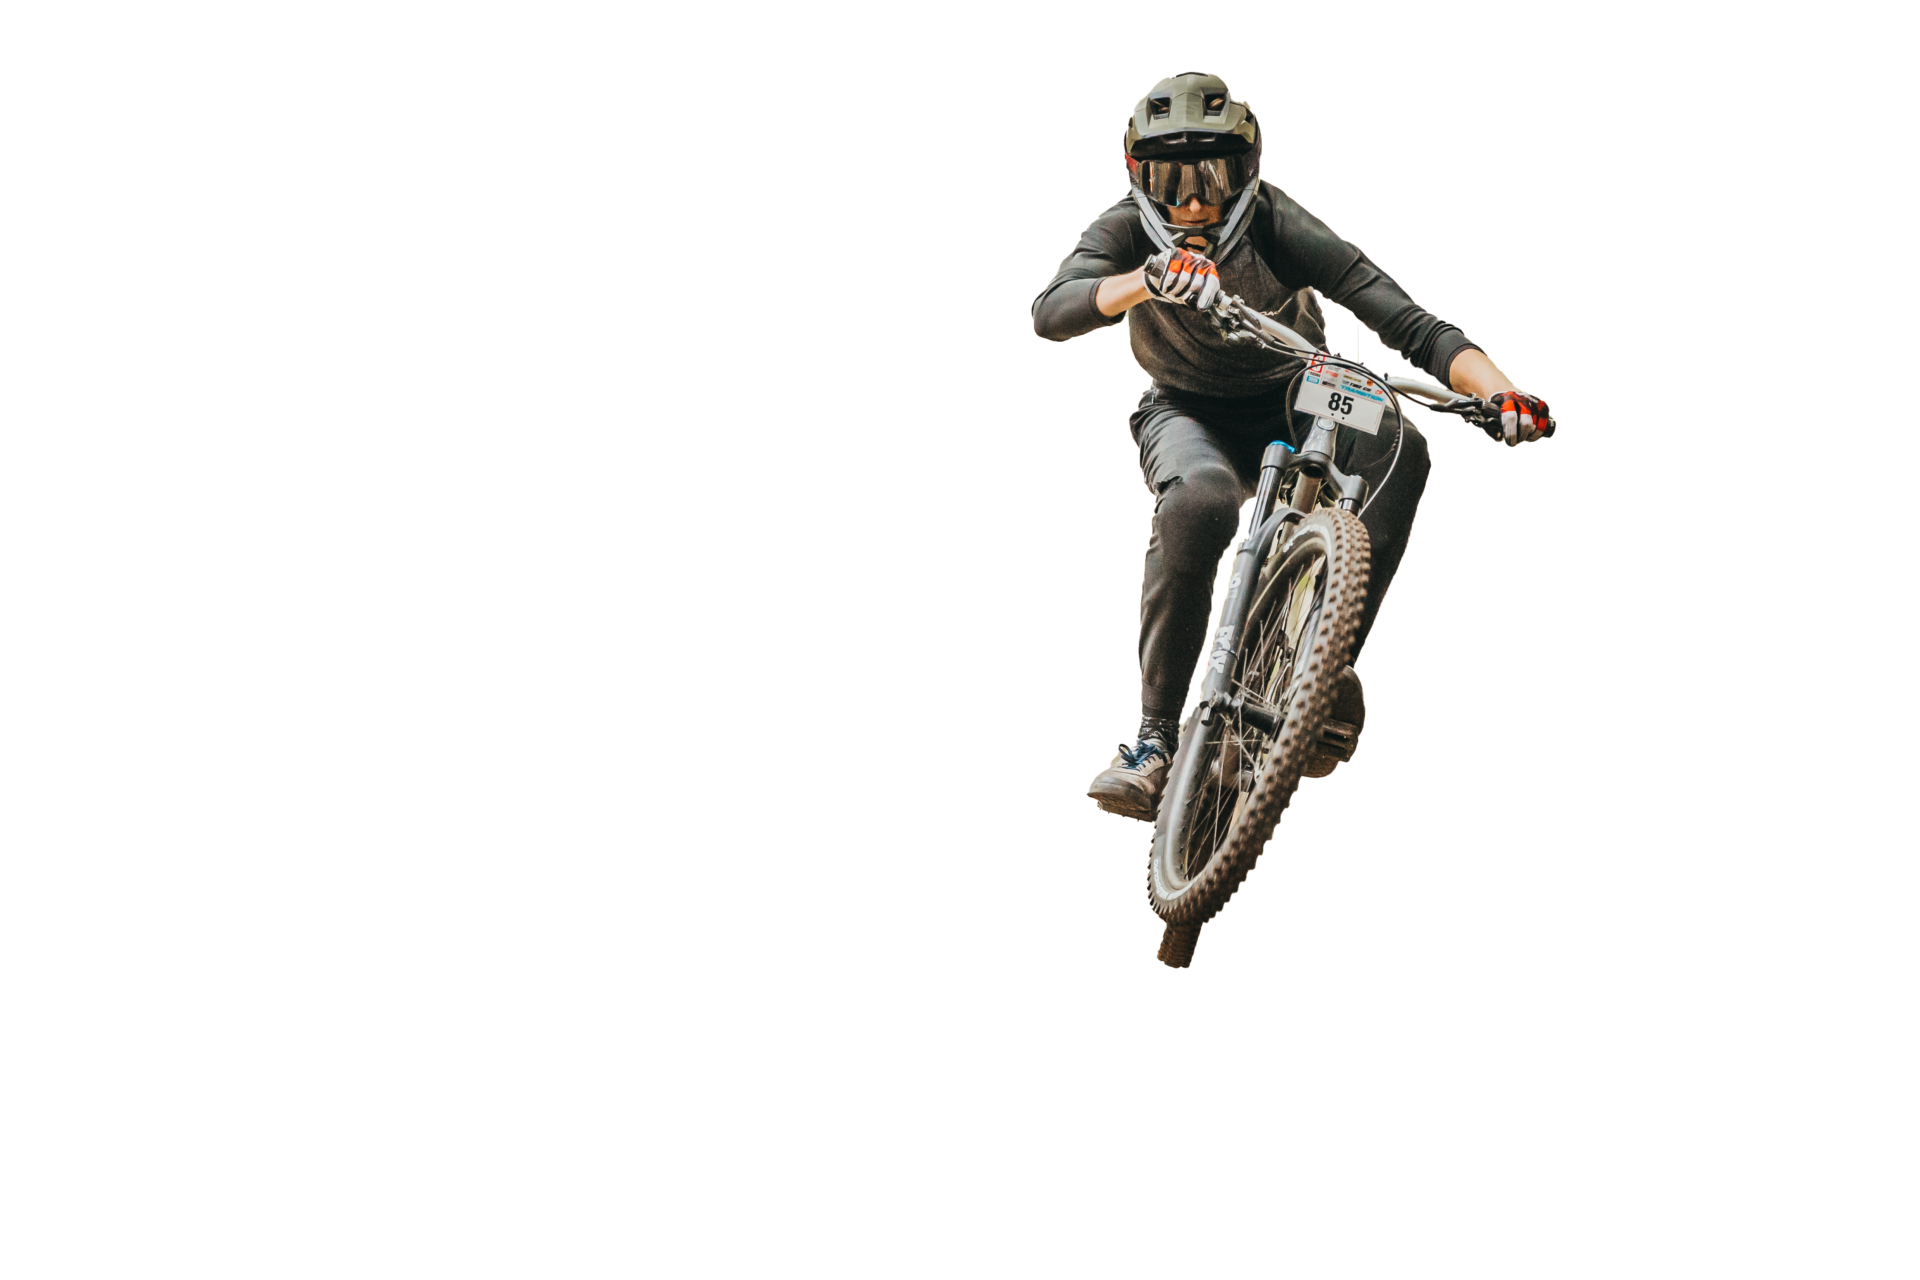 Transition Bikes Southern Enduro Rd1 Milland – Start List 2021